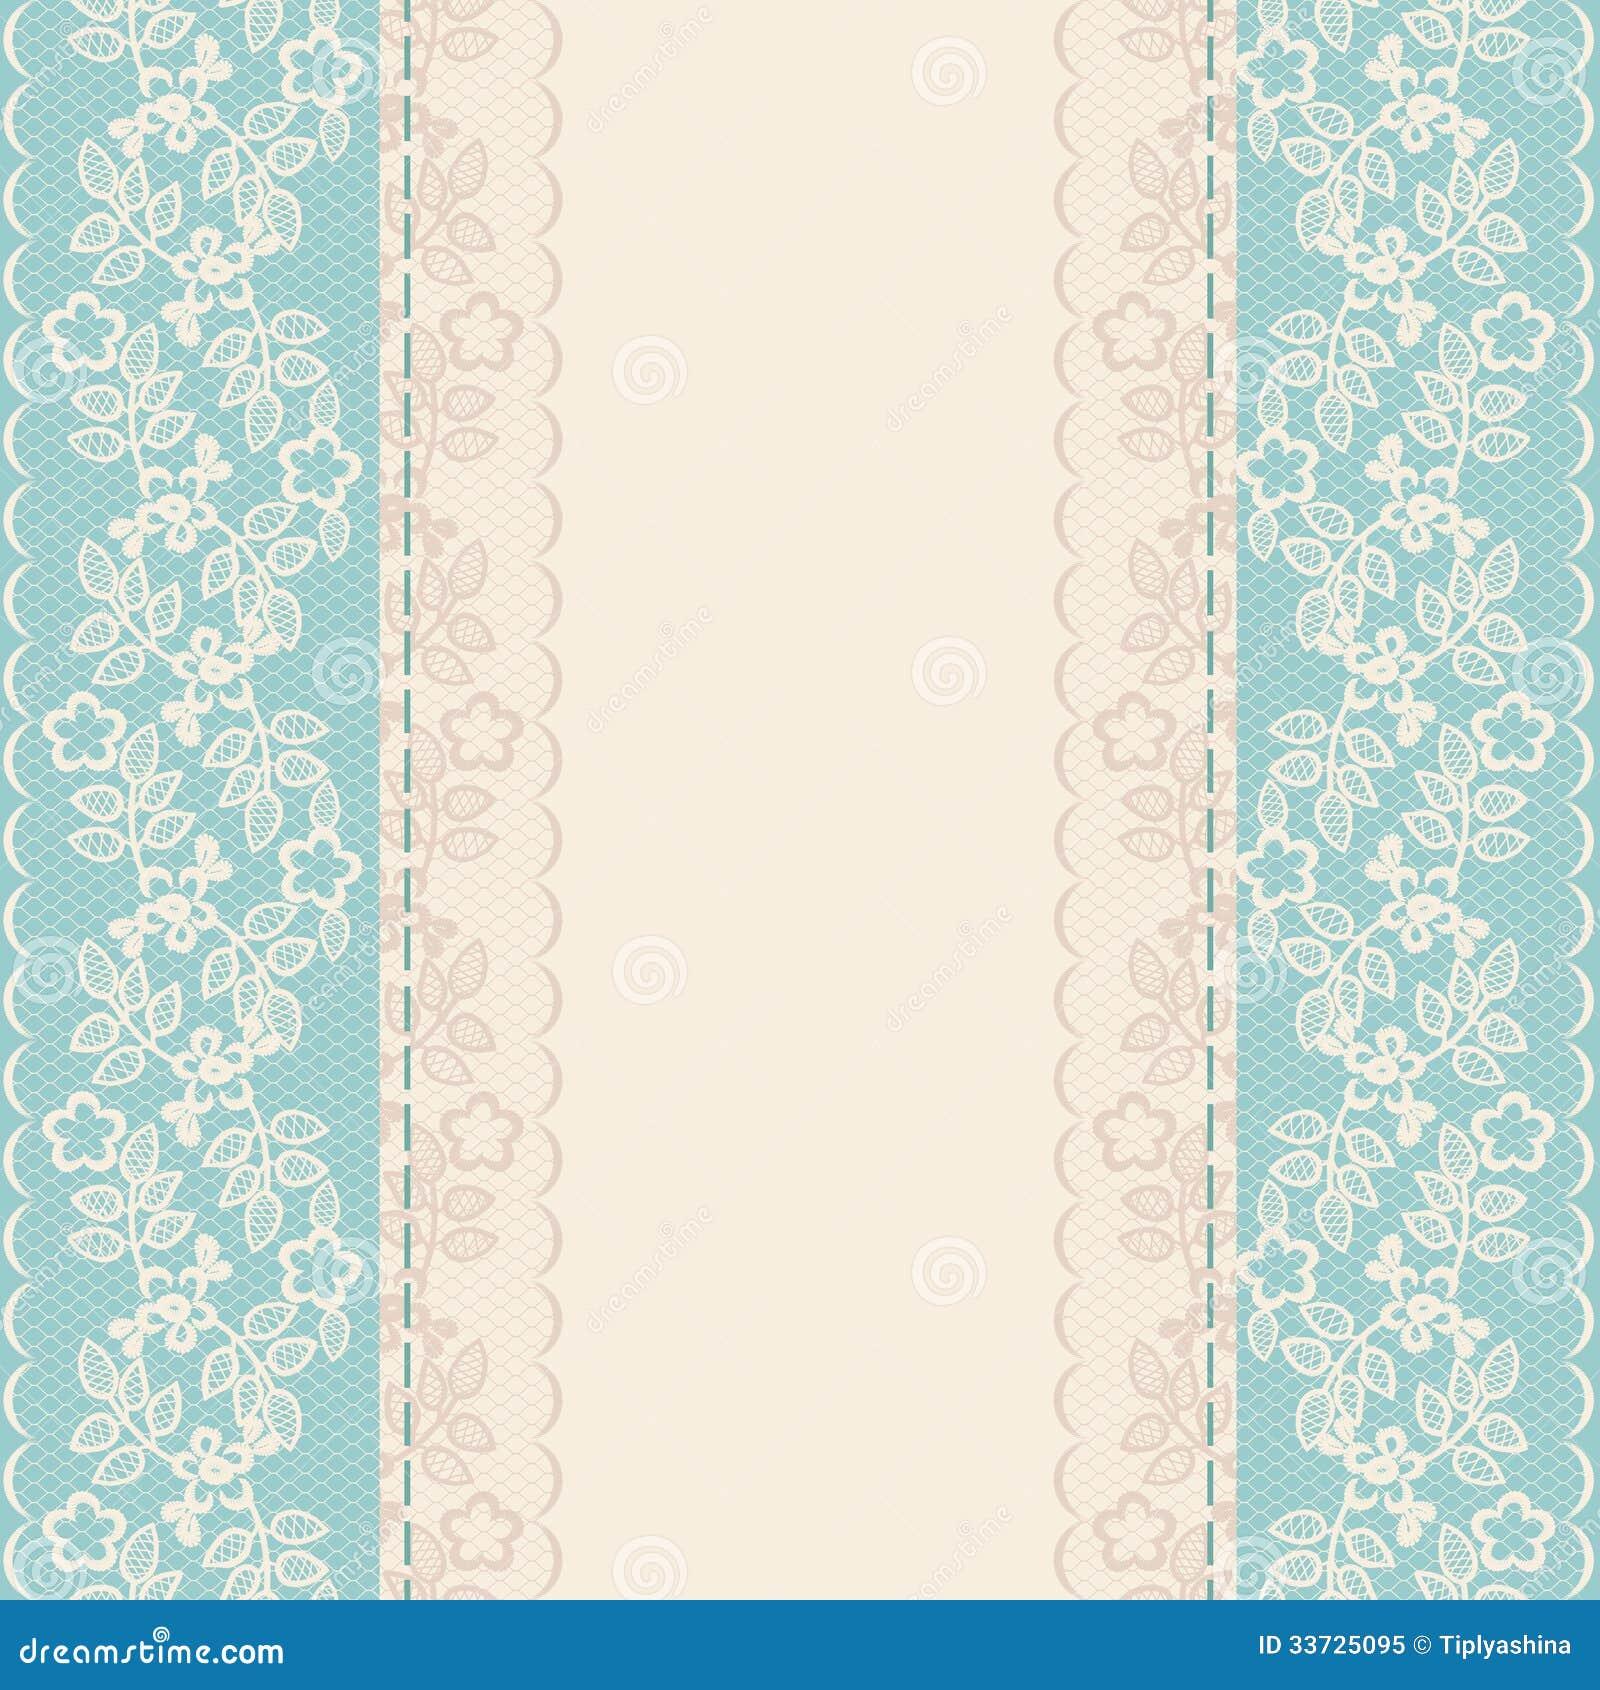 lace border stock image image of fabric tissue seamless 33725095